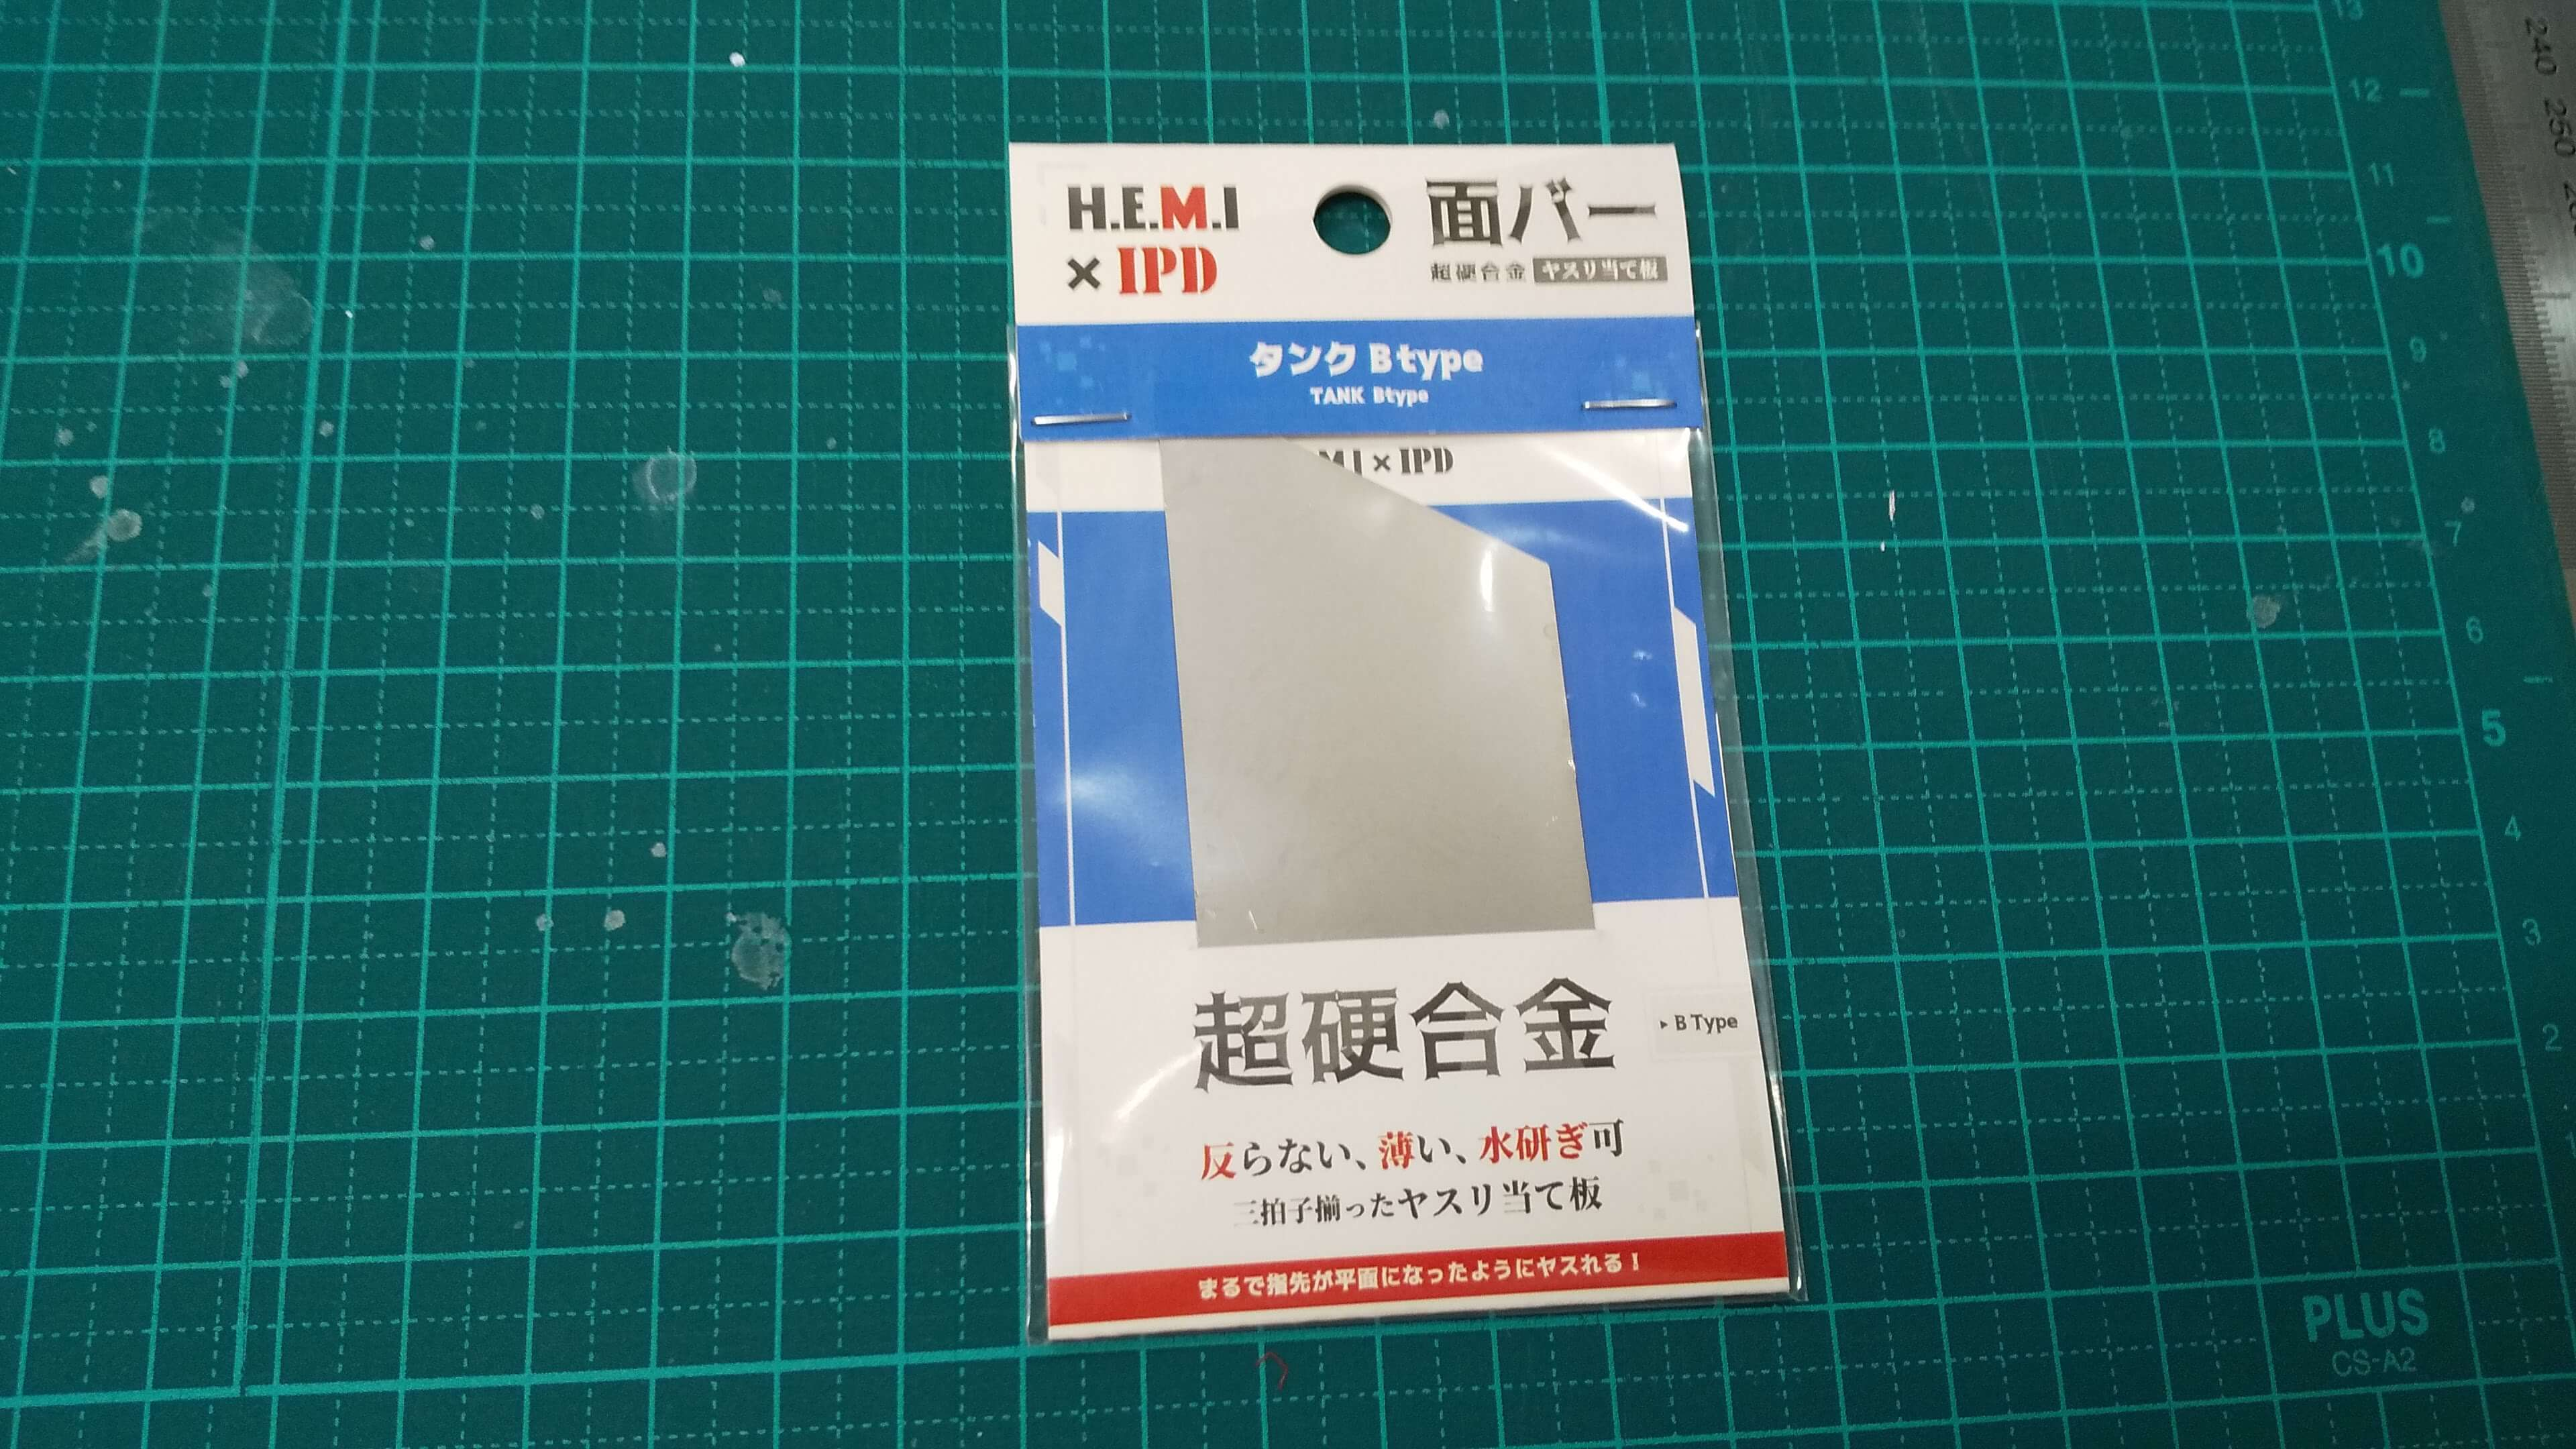 HEMIxIPD 面バー タンク B Type 4570099260105